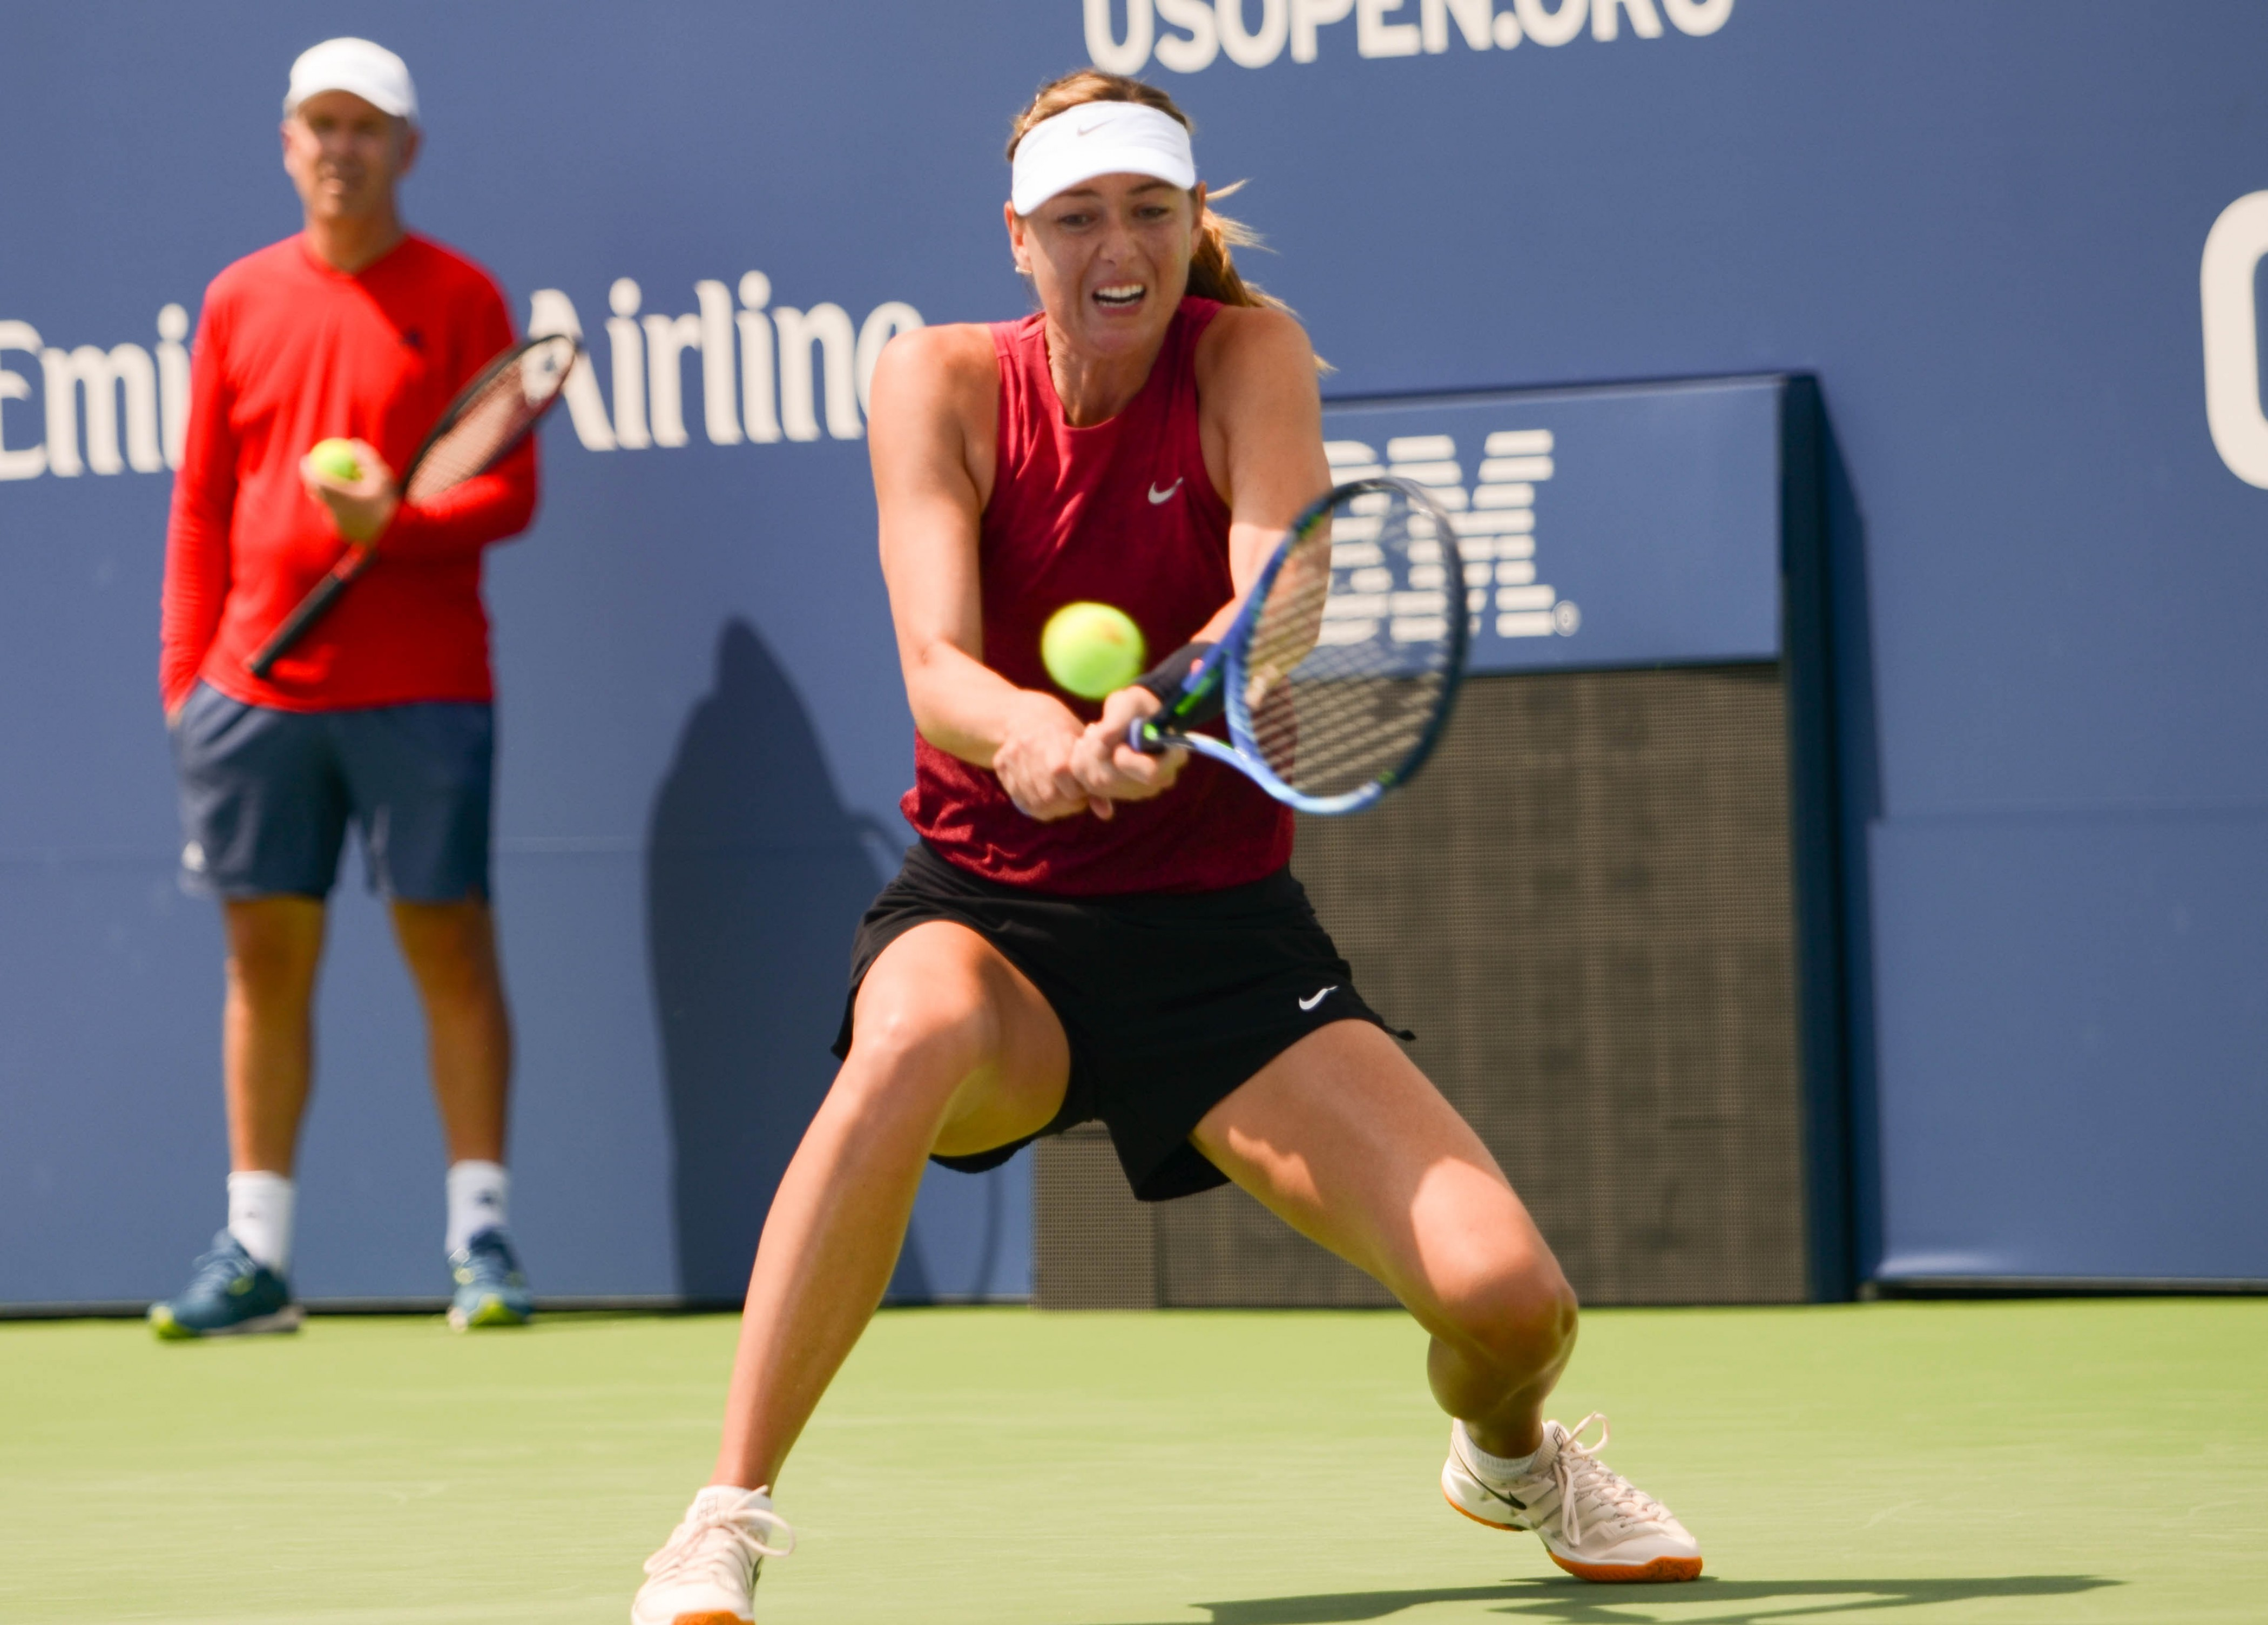 Maria Sharapova to miss the rest of the 2018 season